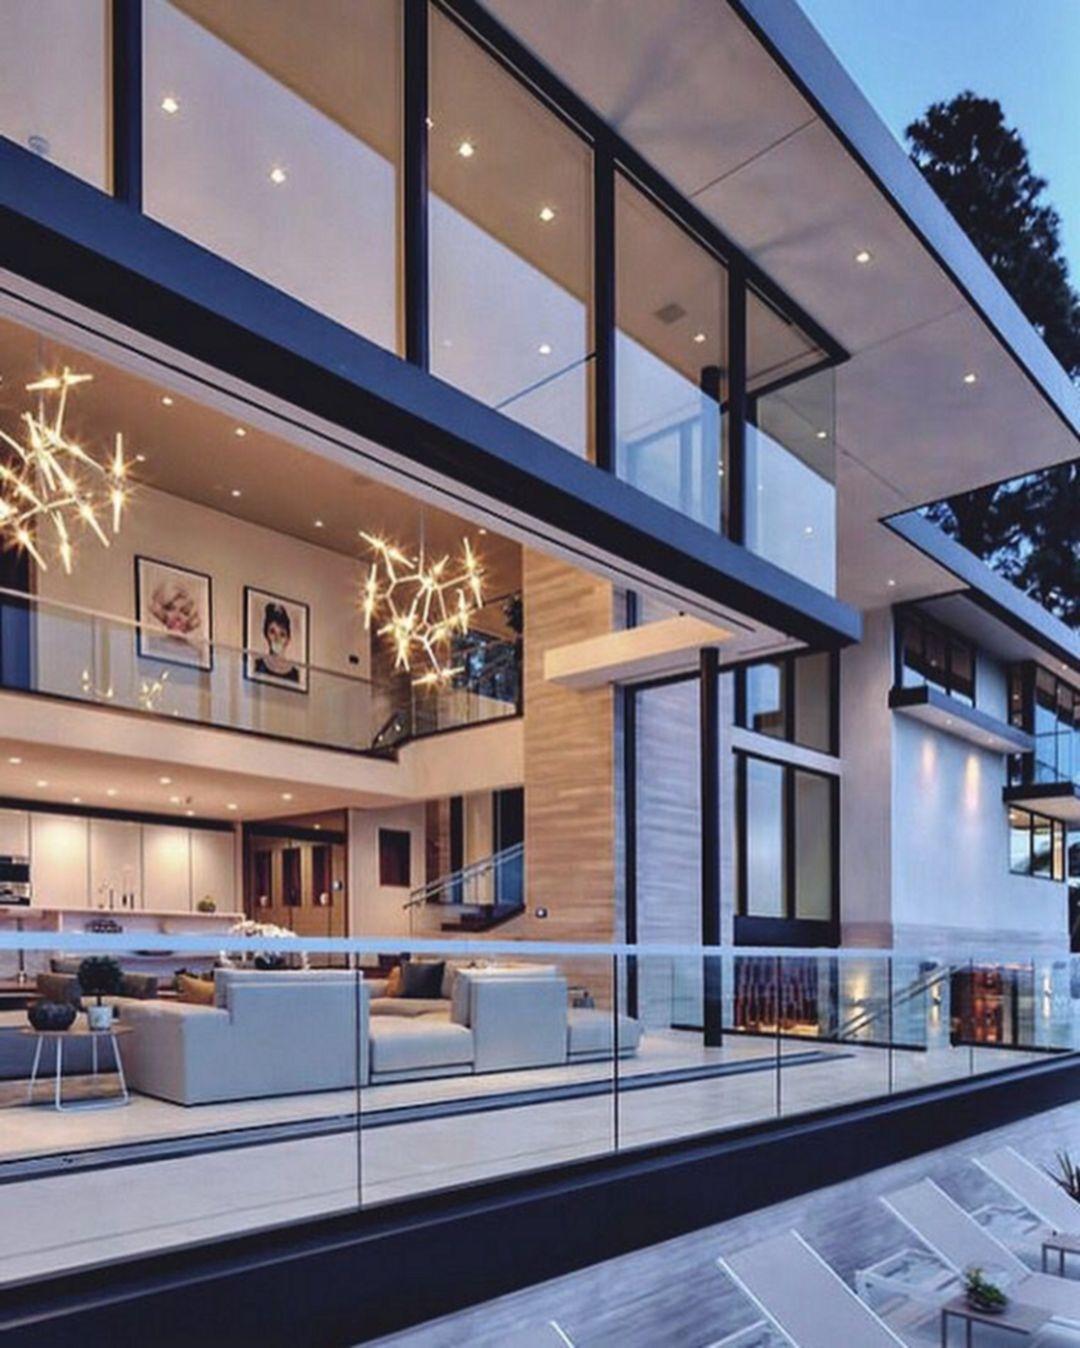 25 Fantastic Luxury Modern House Design Ideas For Live Better Architecture House Modern House Design House Design